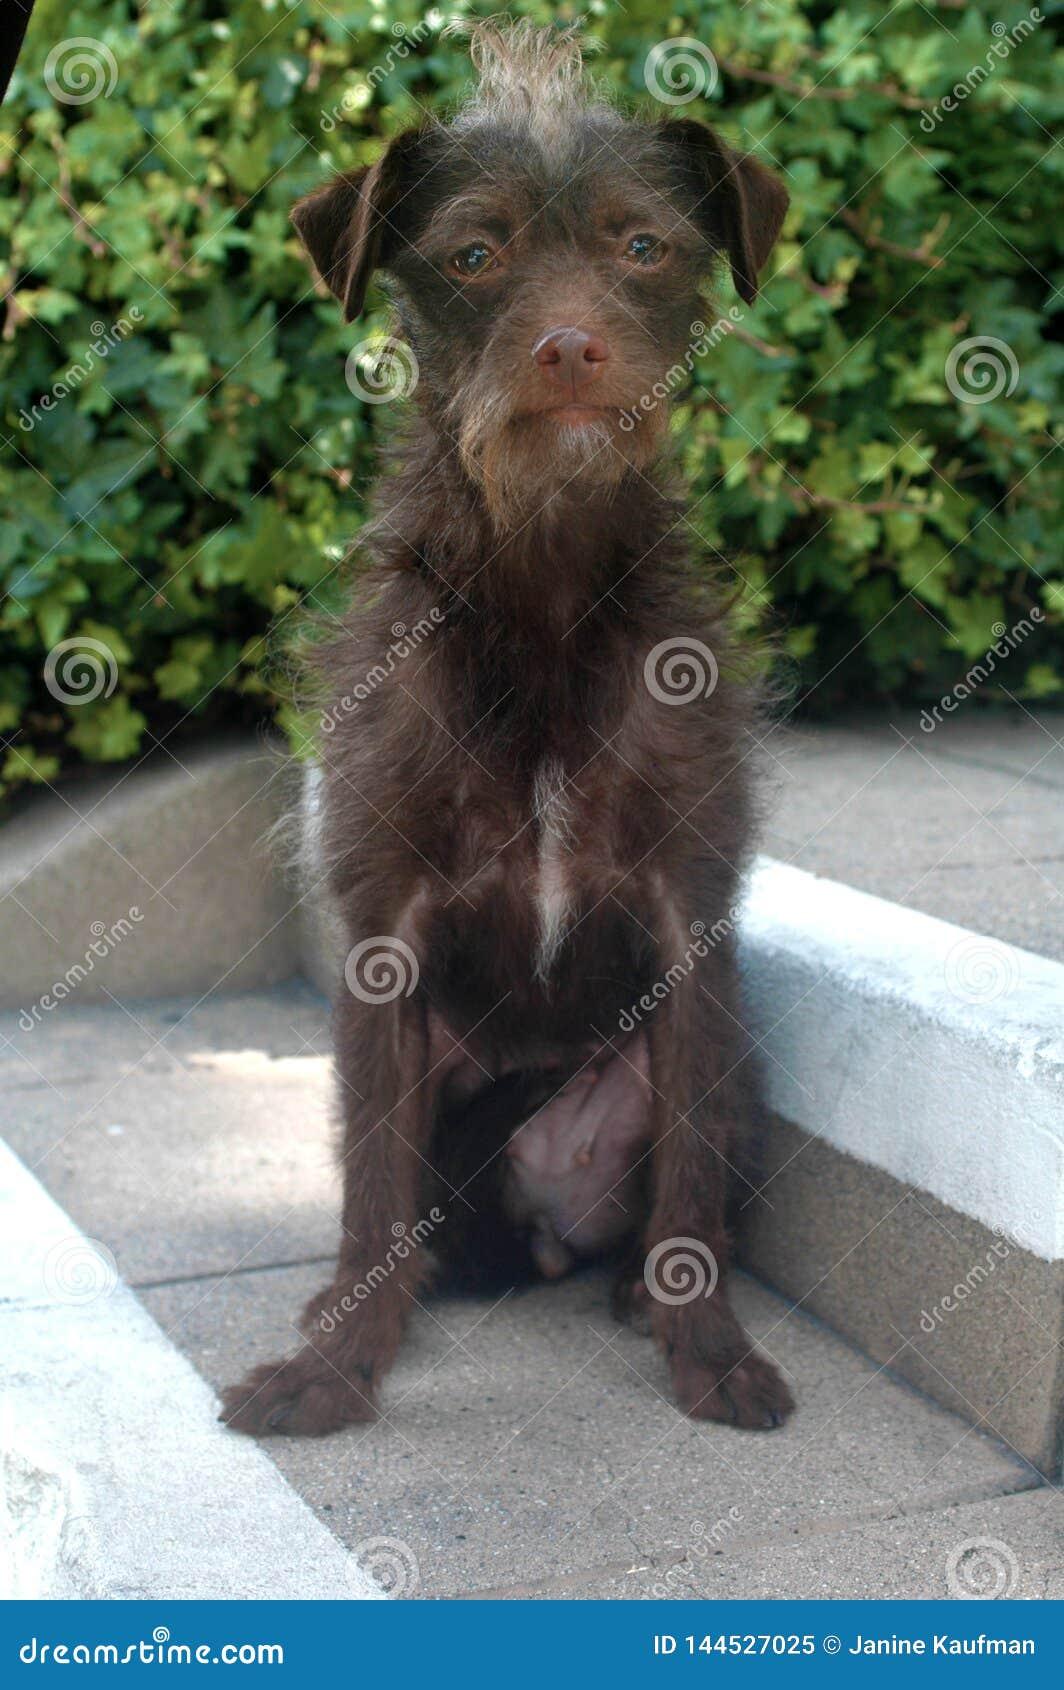 Perrito femenino cabelludo de la raza de la mezcla de Terrier del alambre marrón en pasos